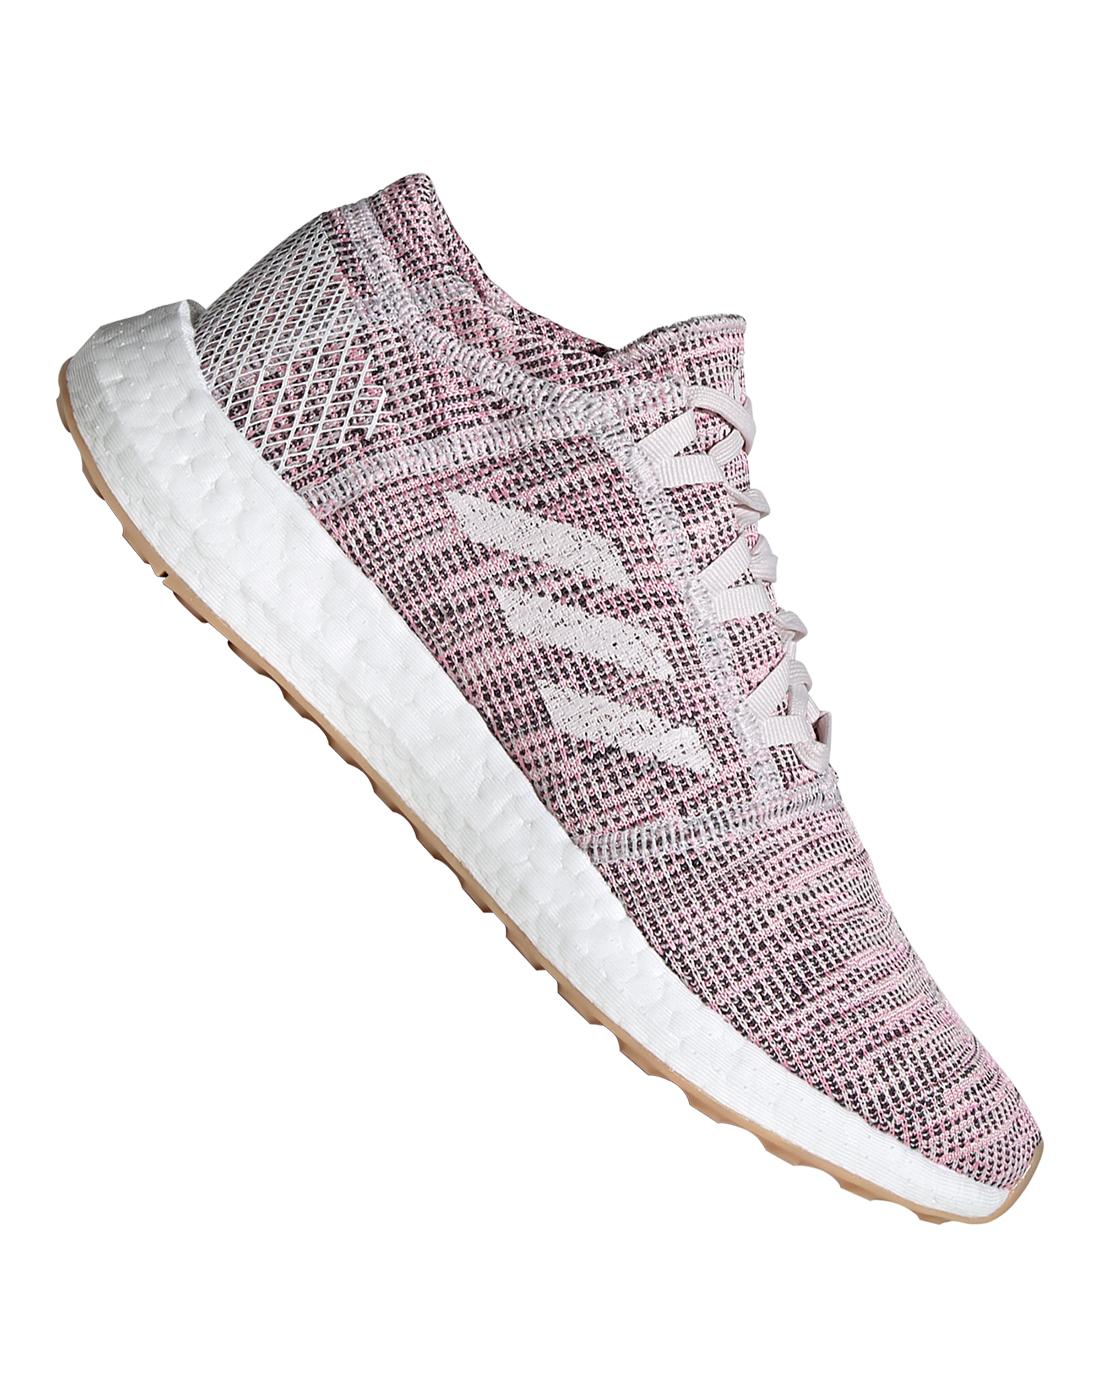 5429d74bf7270 Women s Purple adidas Pureboost Go